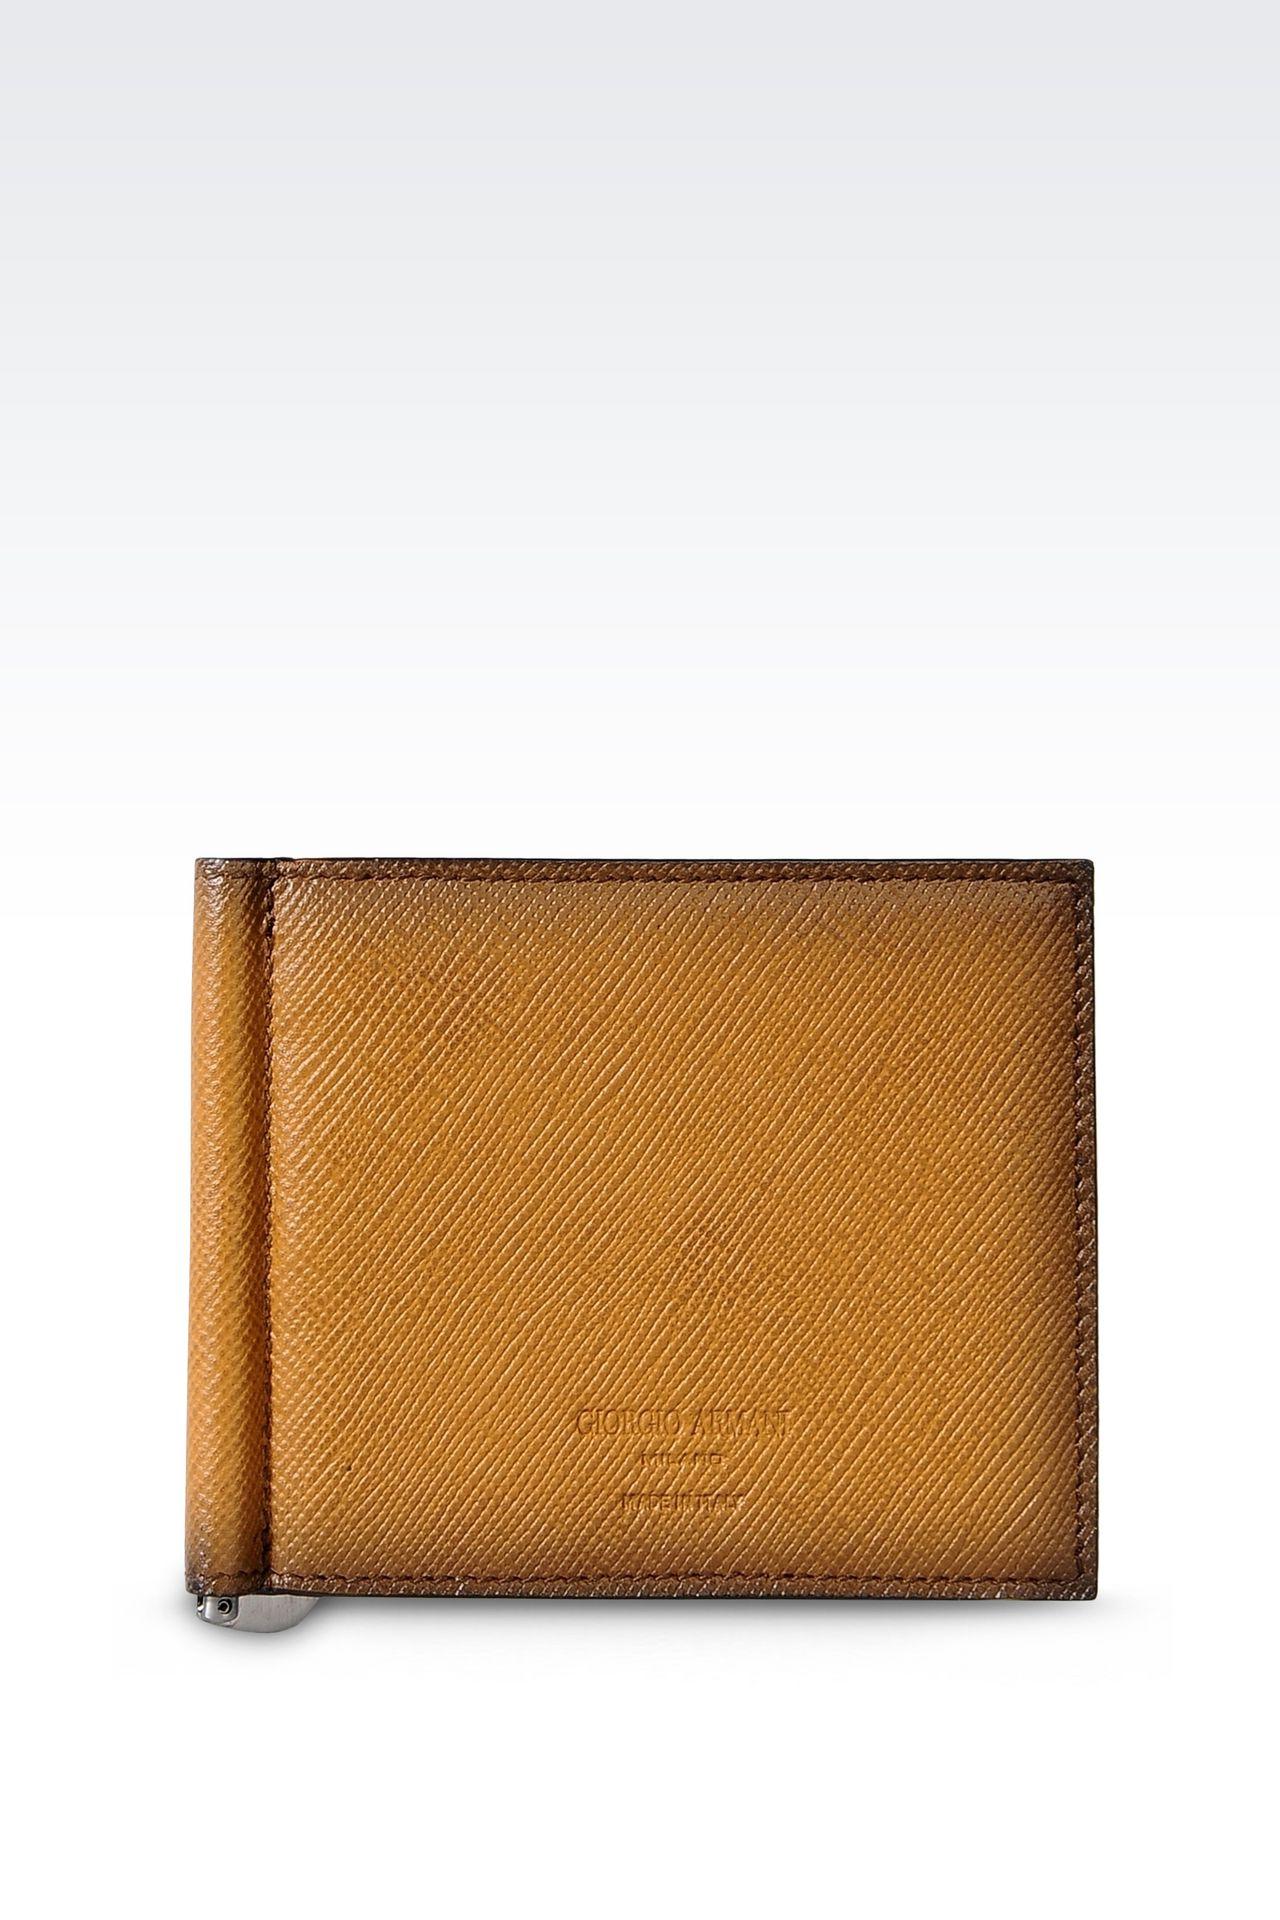 BI-FOLD WALLET IN SAFFIANO CALFSKIN WITH MONEY CLIP: Wallets Men by Armani - 0